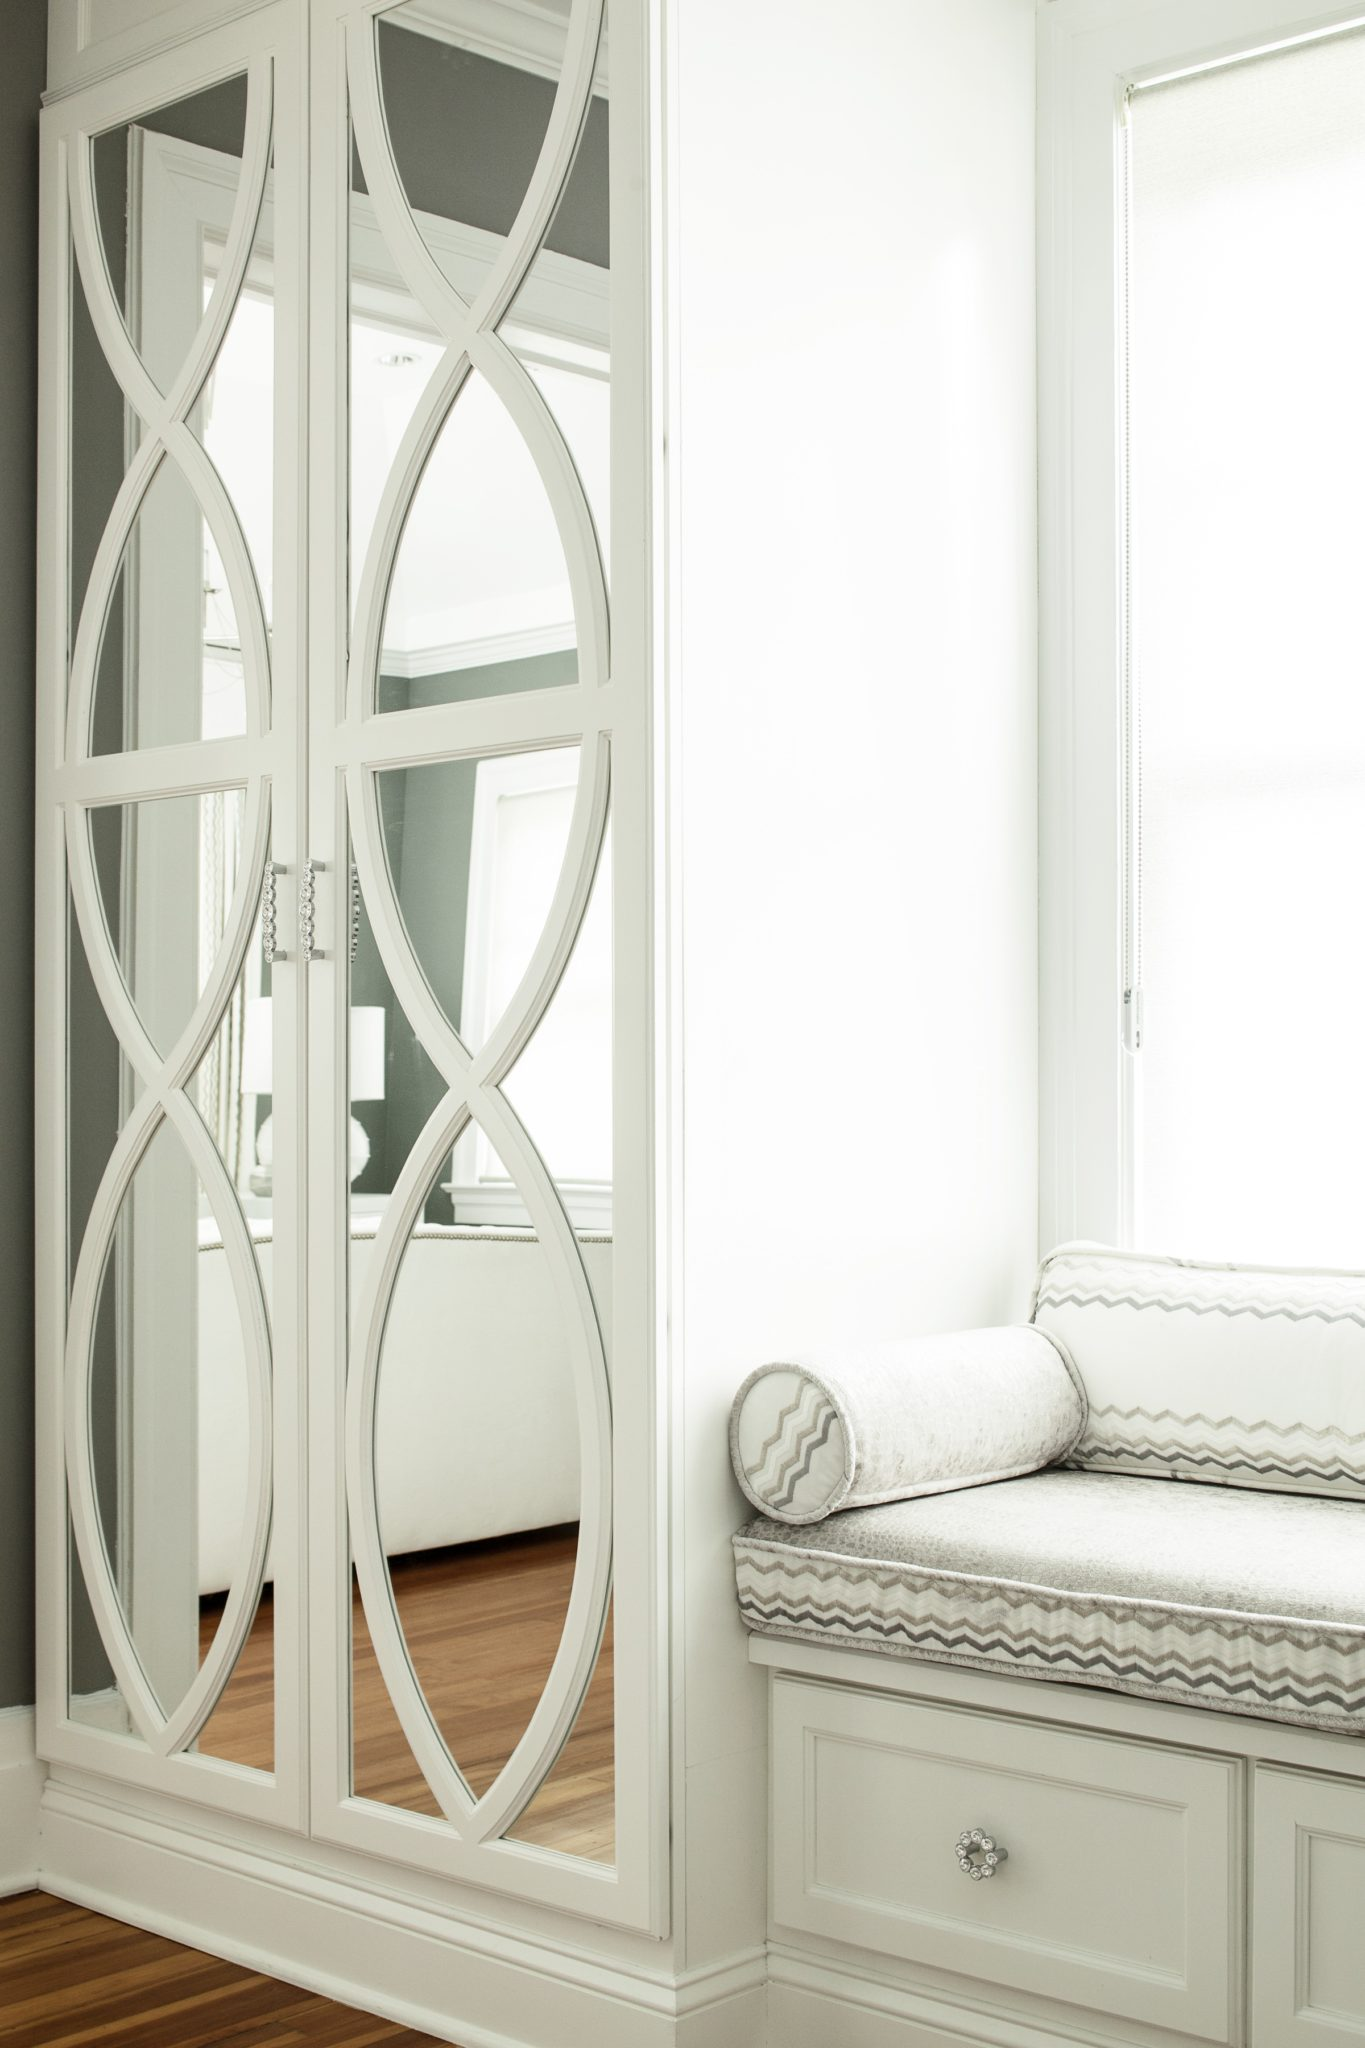 Custom built-in detail by Karen B Wolf Interiors